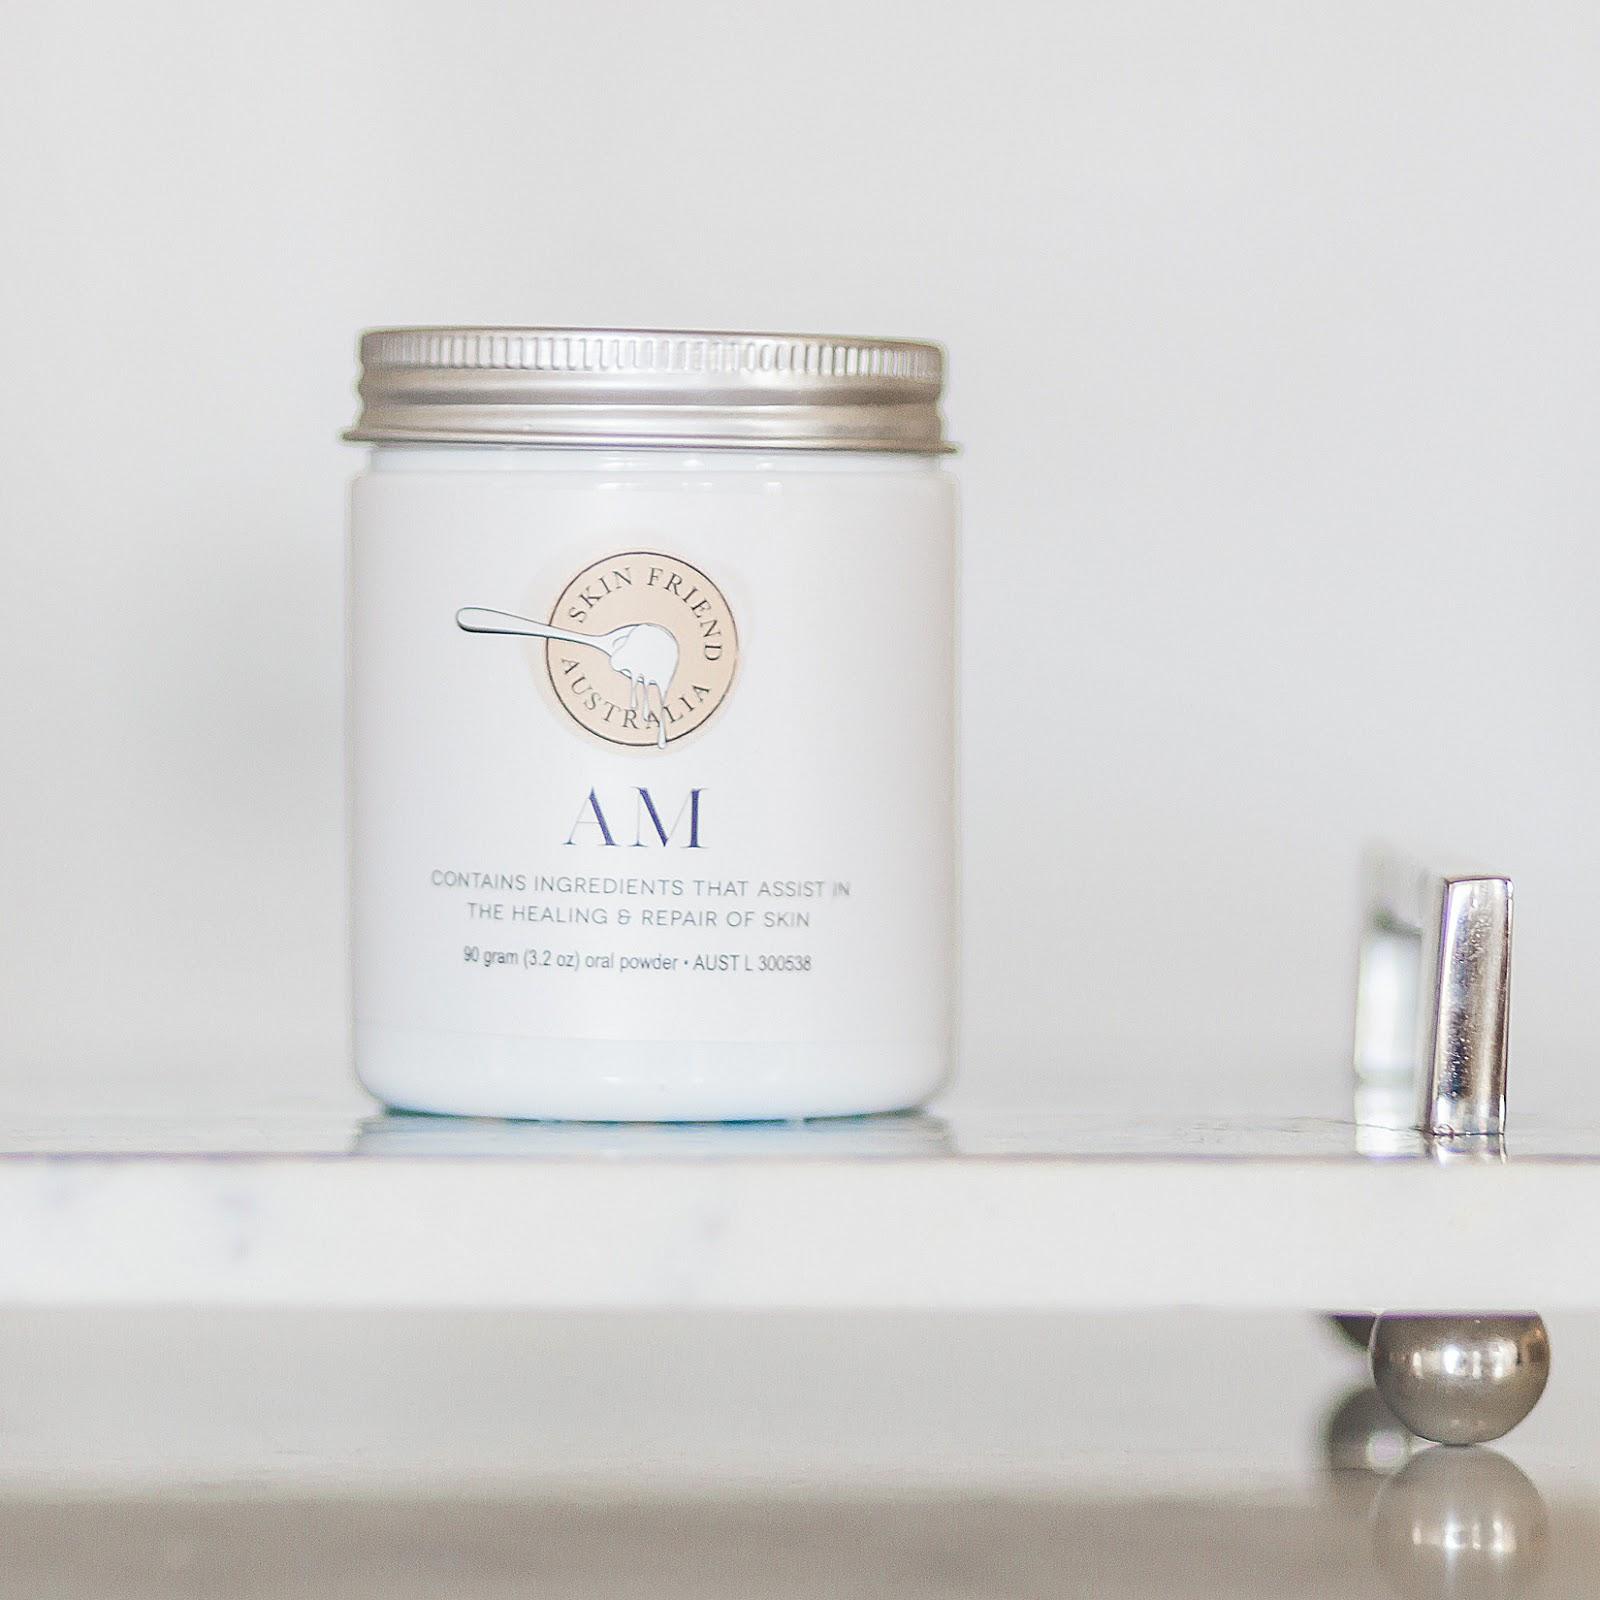 Skin Friend AM Supplement Review